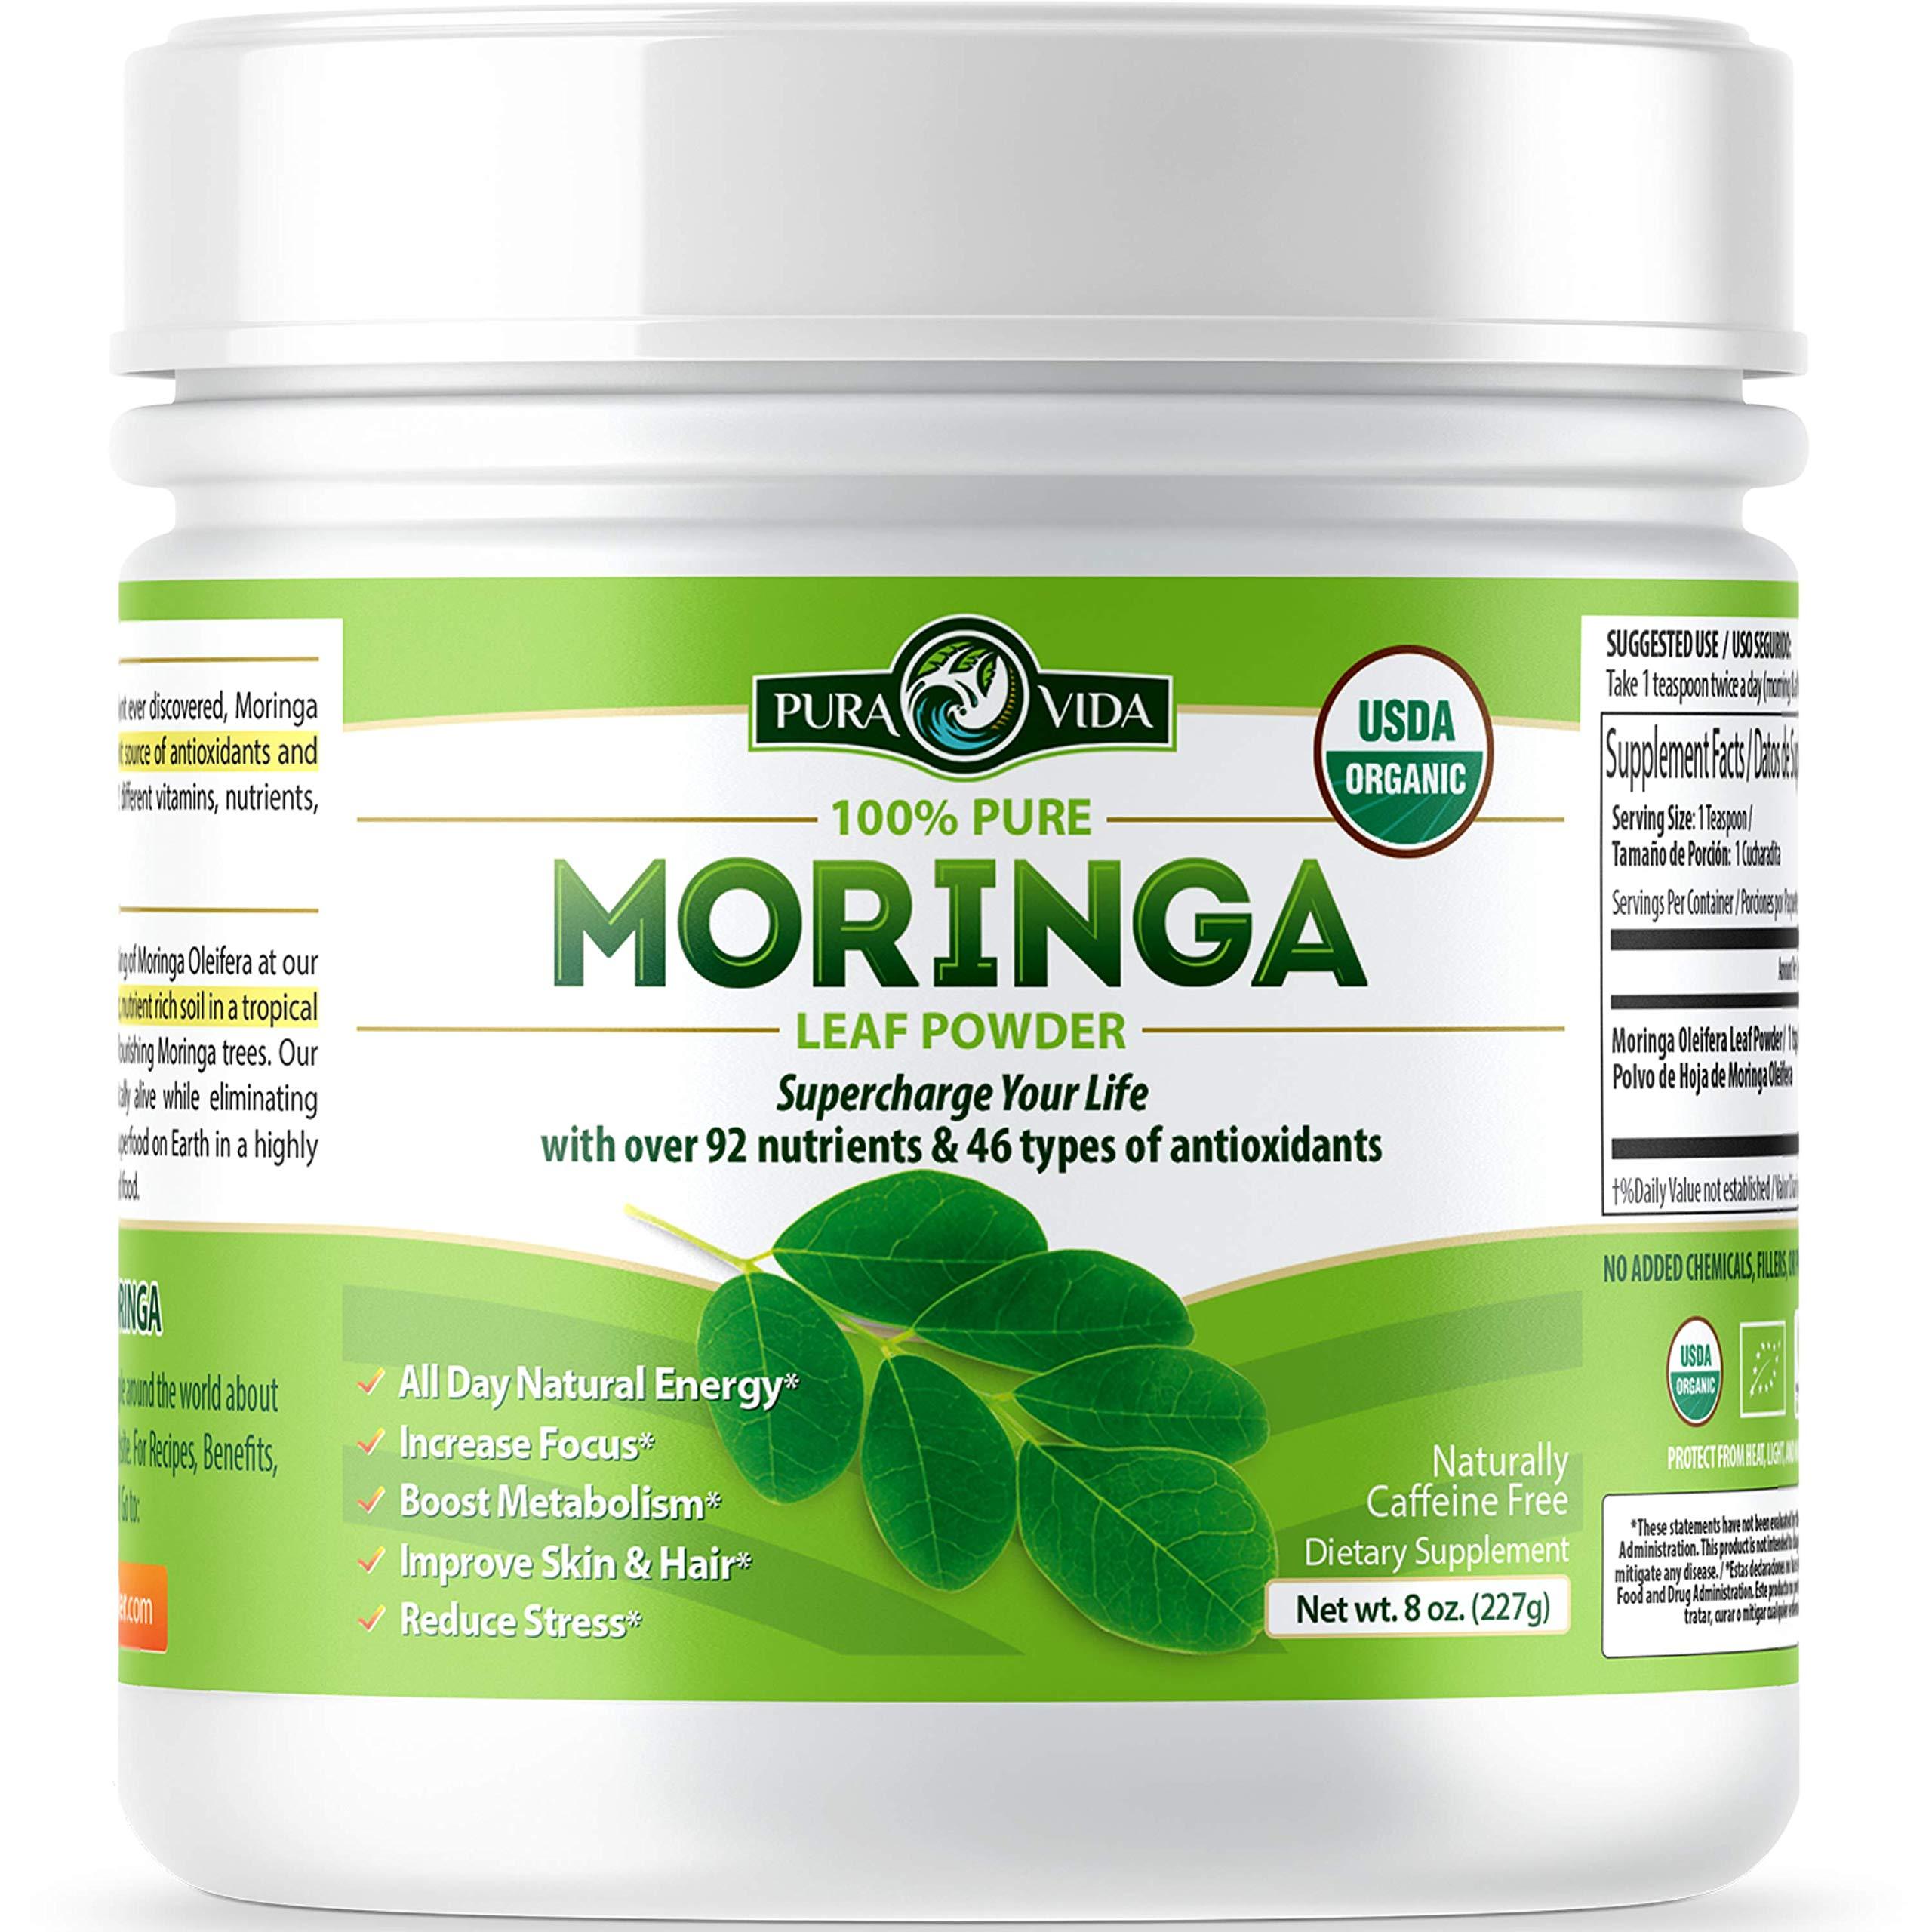 Organic Moringa Oleifera Leaf Powder - USDA Certified Organic Single Origin Moringa Powder from Nicaragua. Perfect for Smoothies, Recipes and Moringa Tea. 8 oz. by Pura Vida Supplements